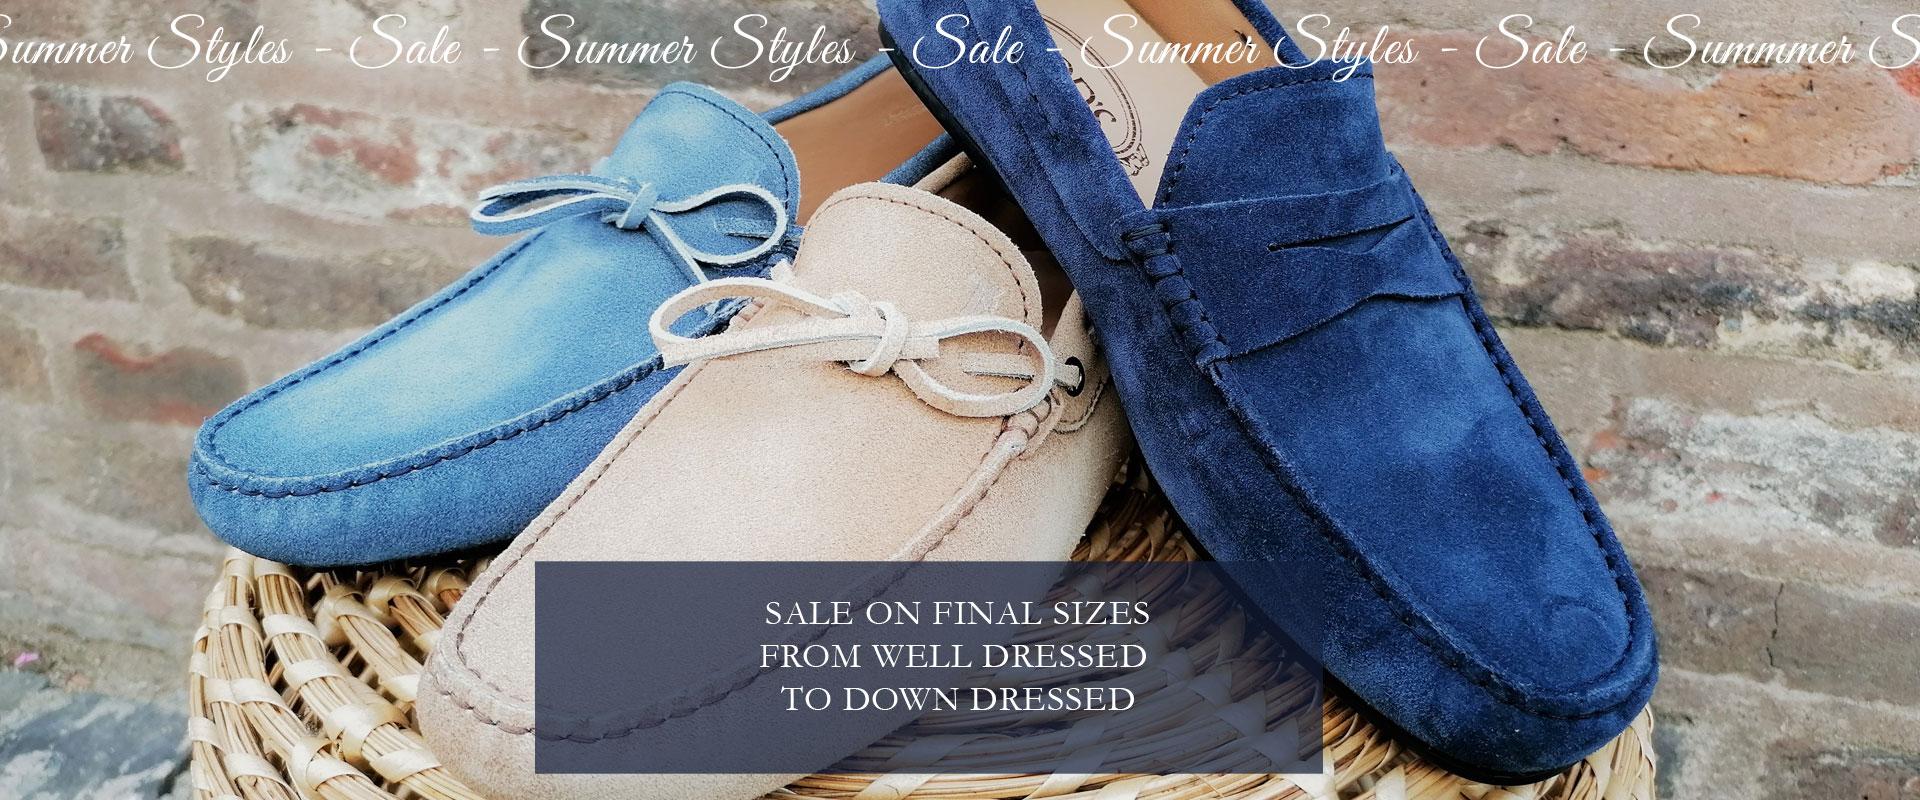 Sale final sizes